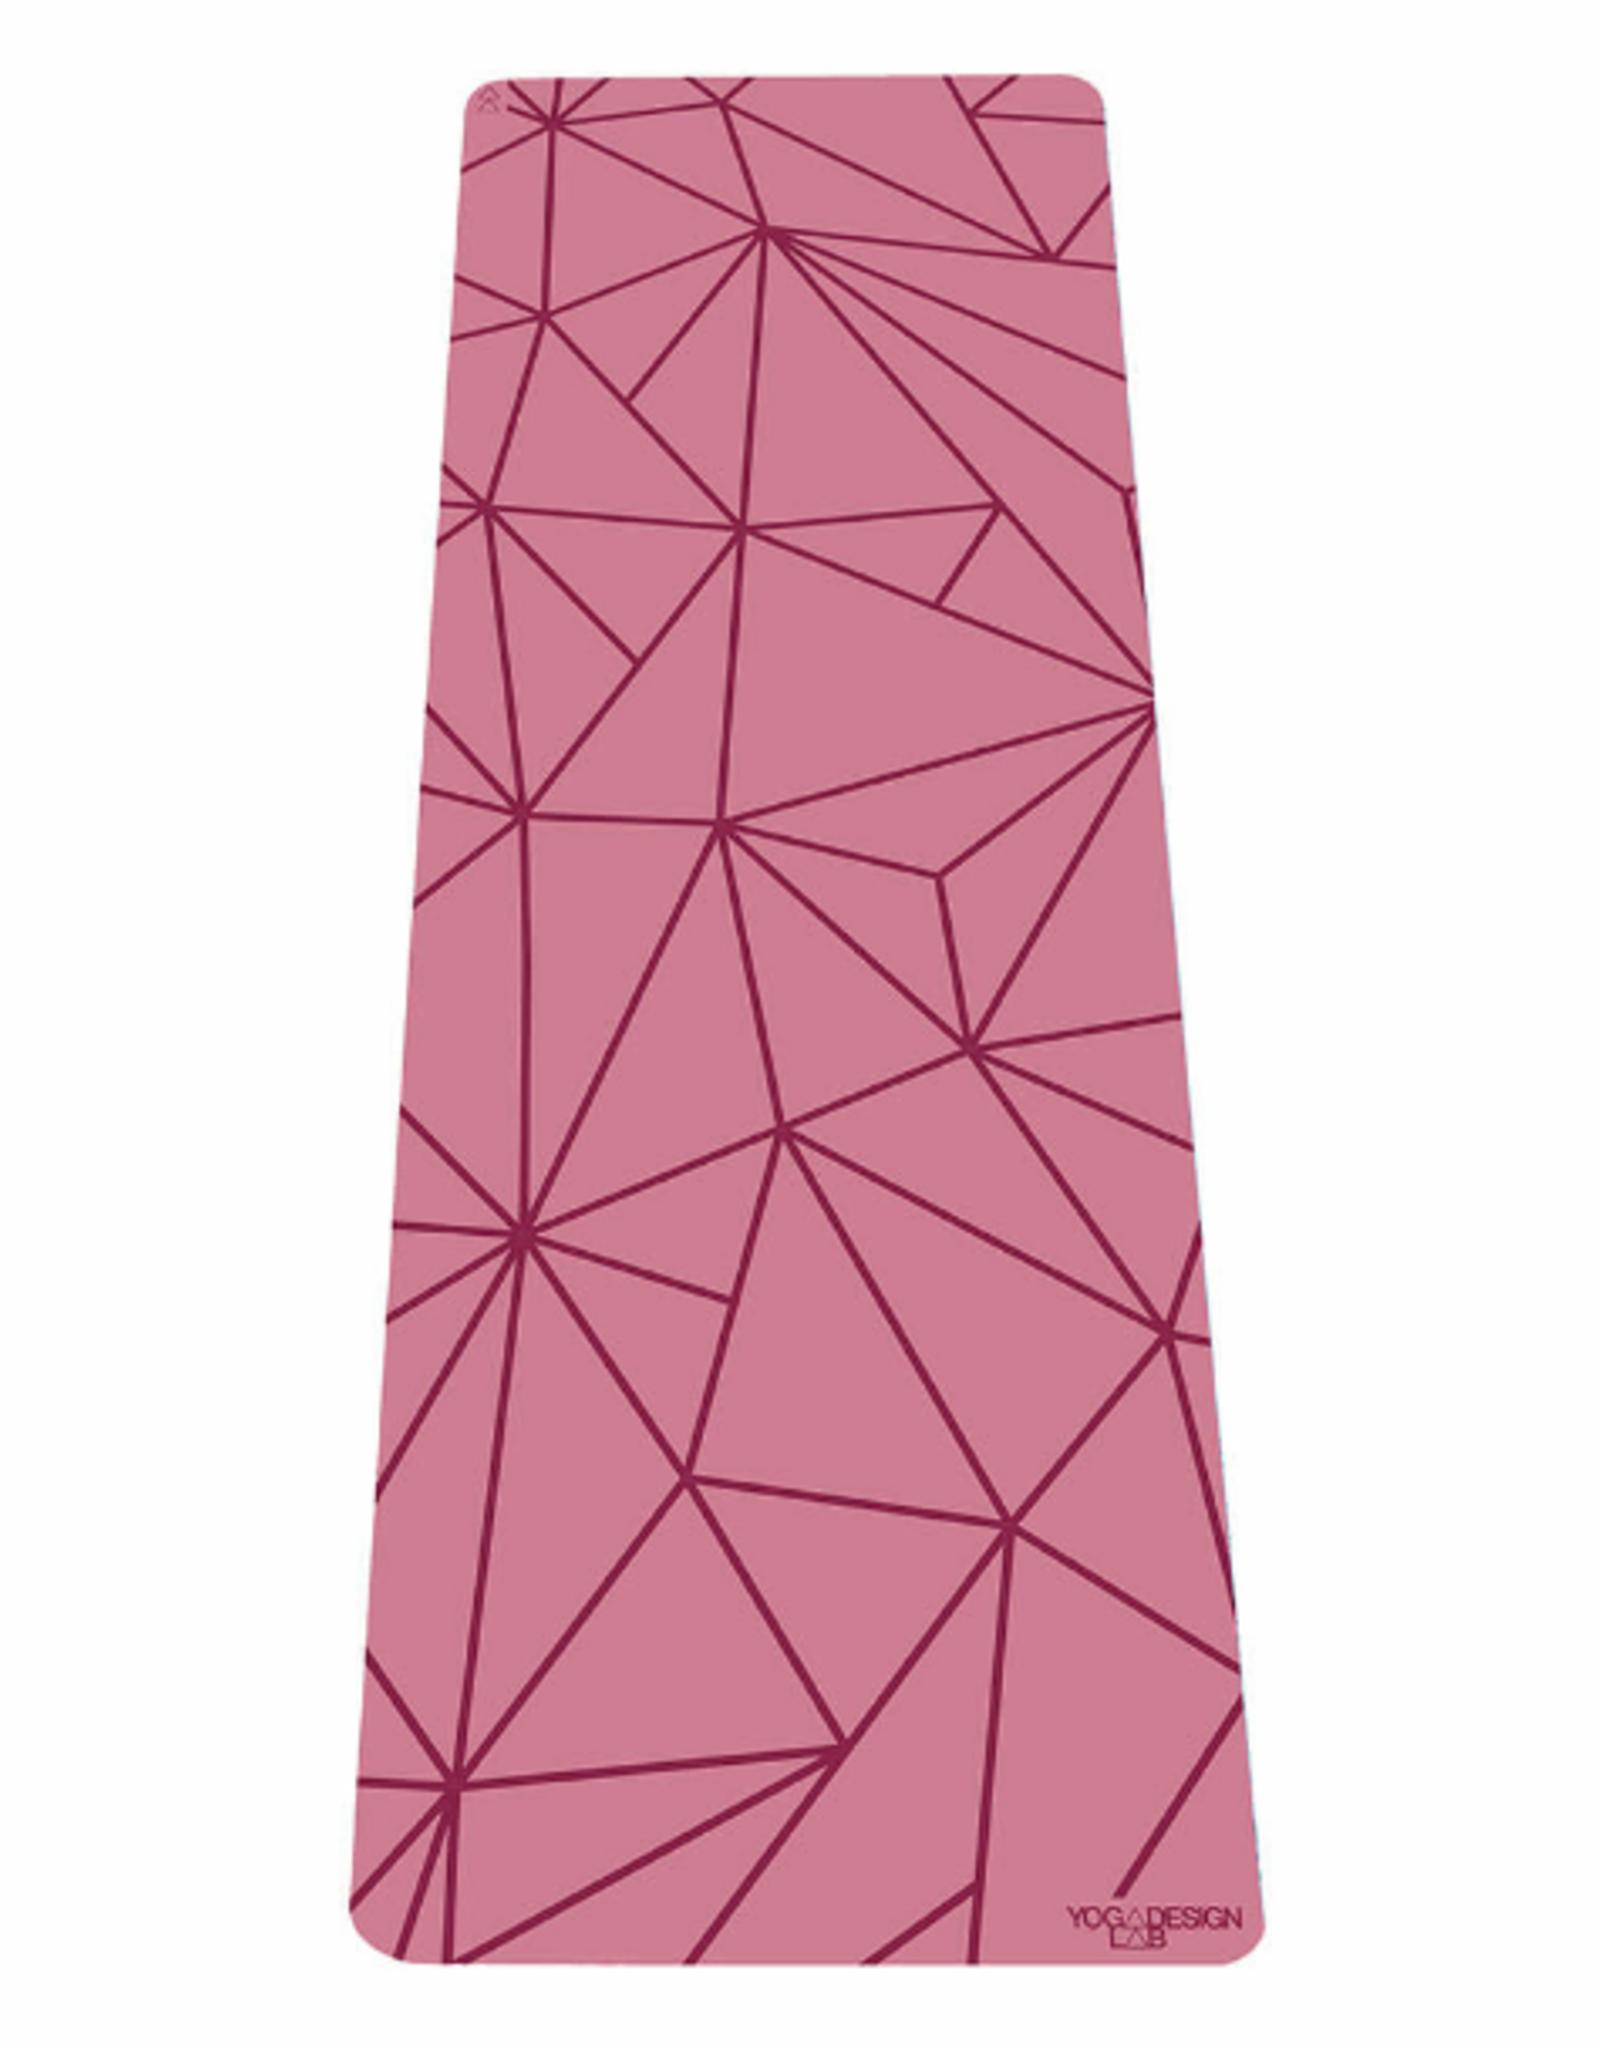 Yoga Design Lab Infinity Mat - 5mm - Geo Rose